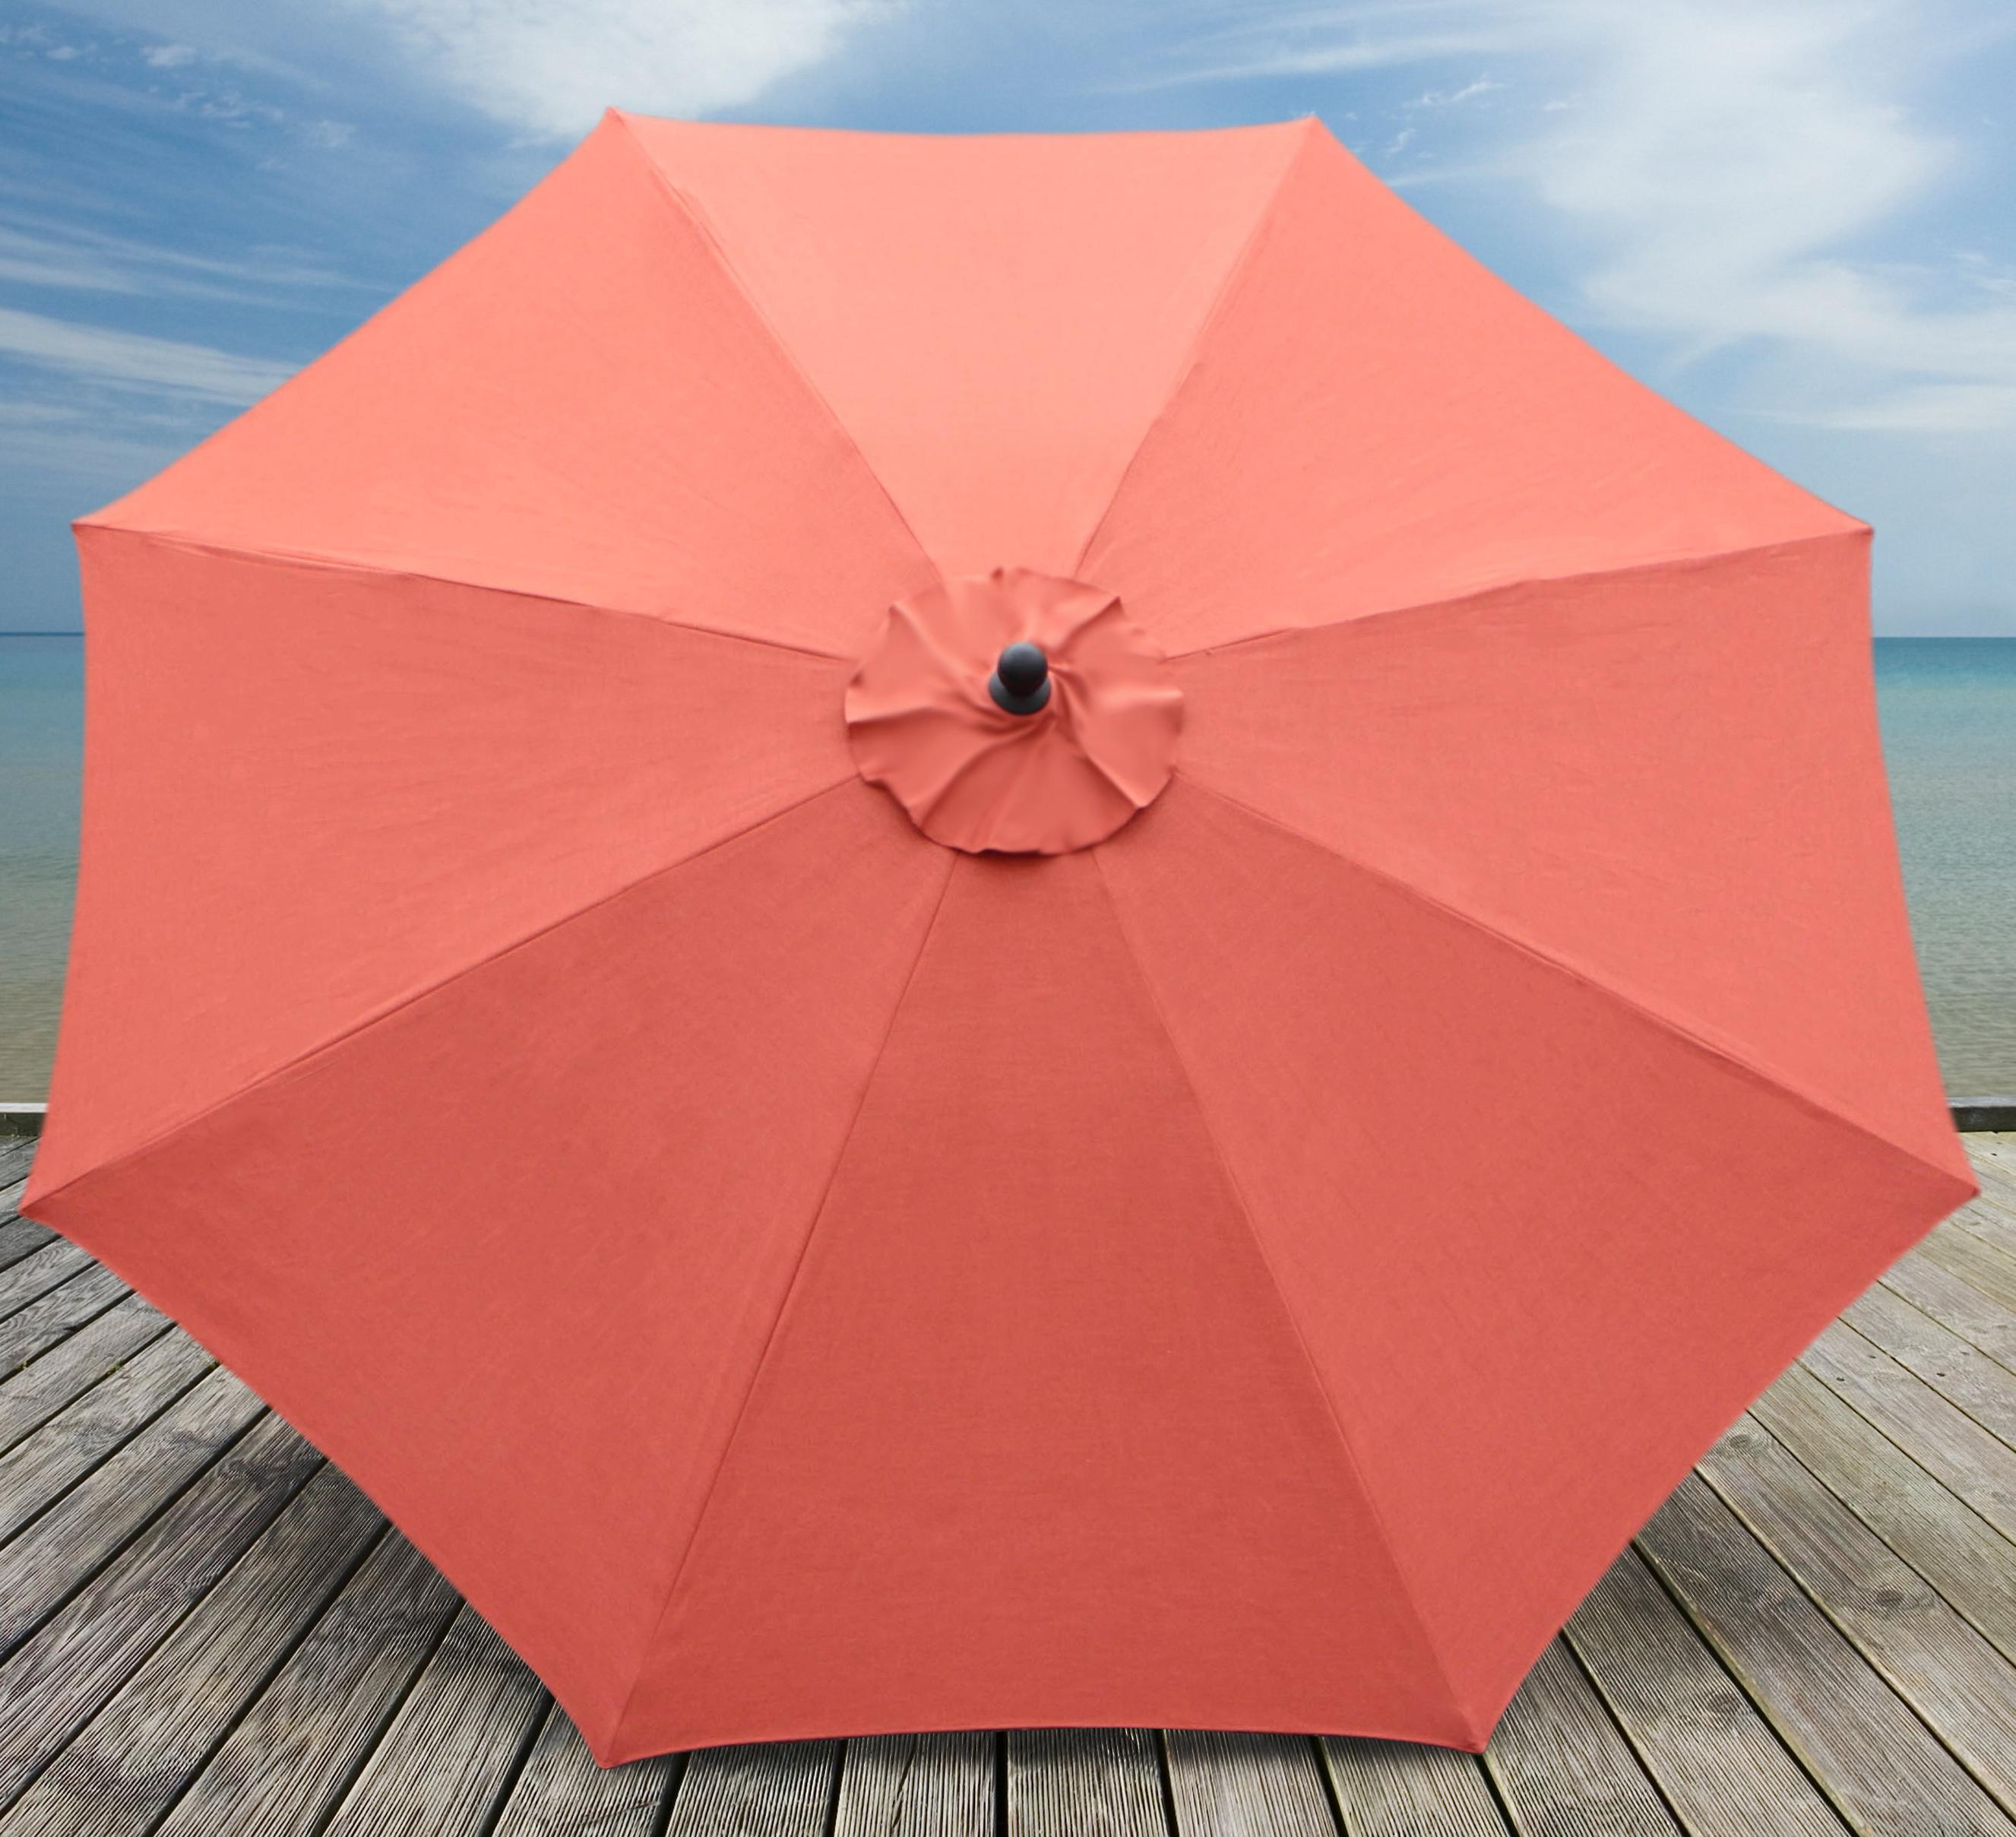 Mucci Madilyn 10' Market Sunbrella Umbrella With Current Mucci Madilyn Market Sunbrella Umbrellas (Gallery 2 of 20)